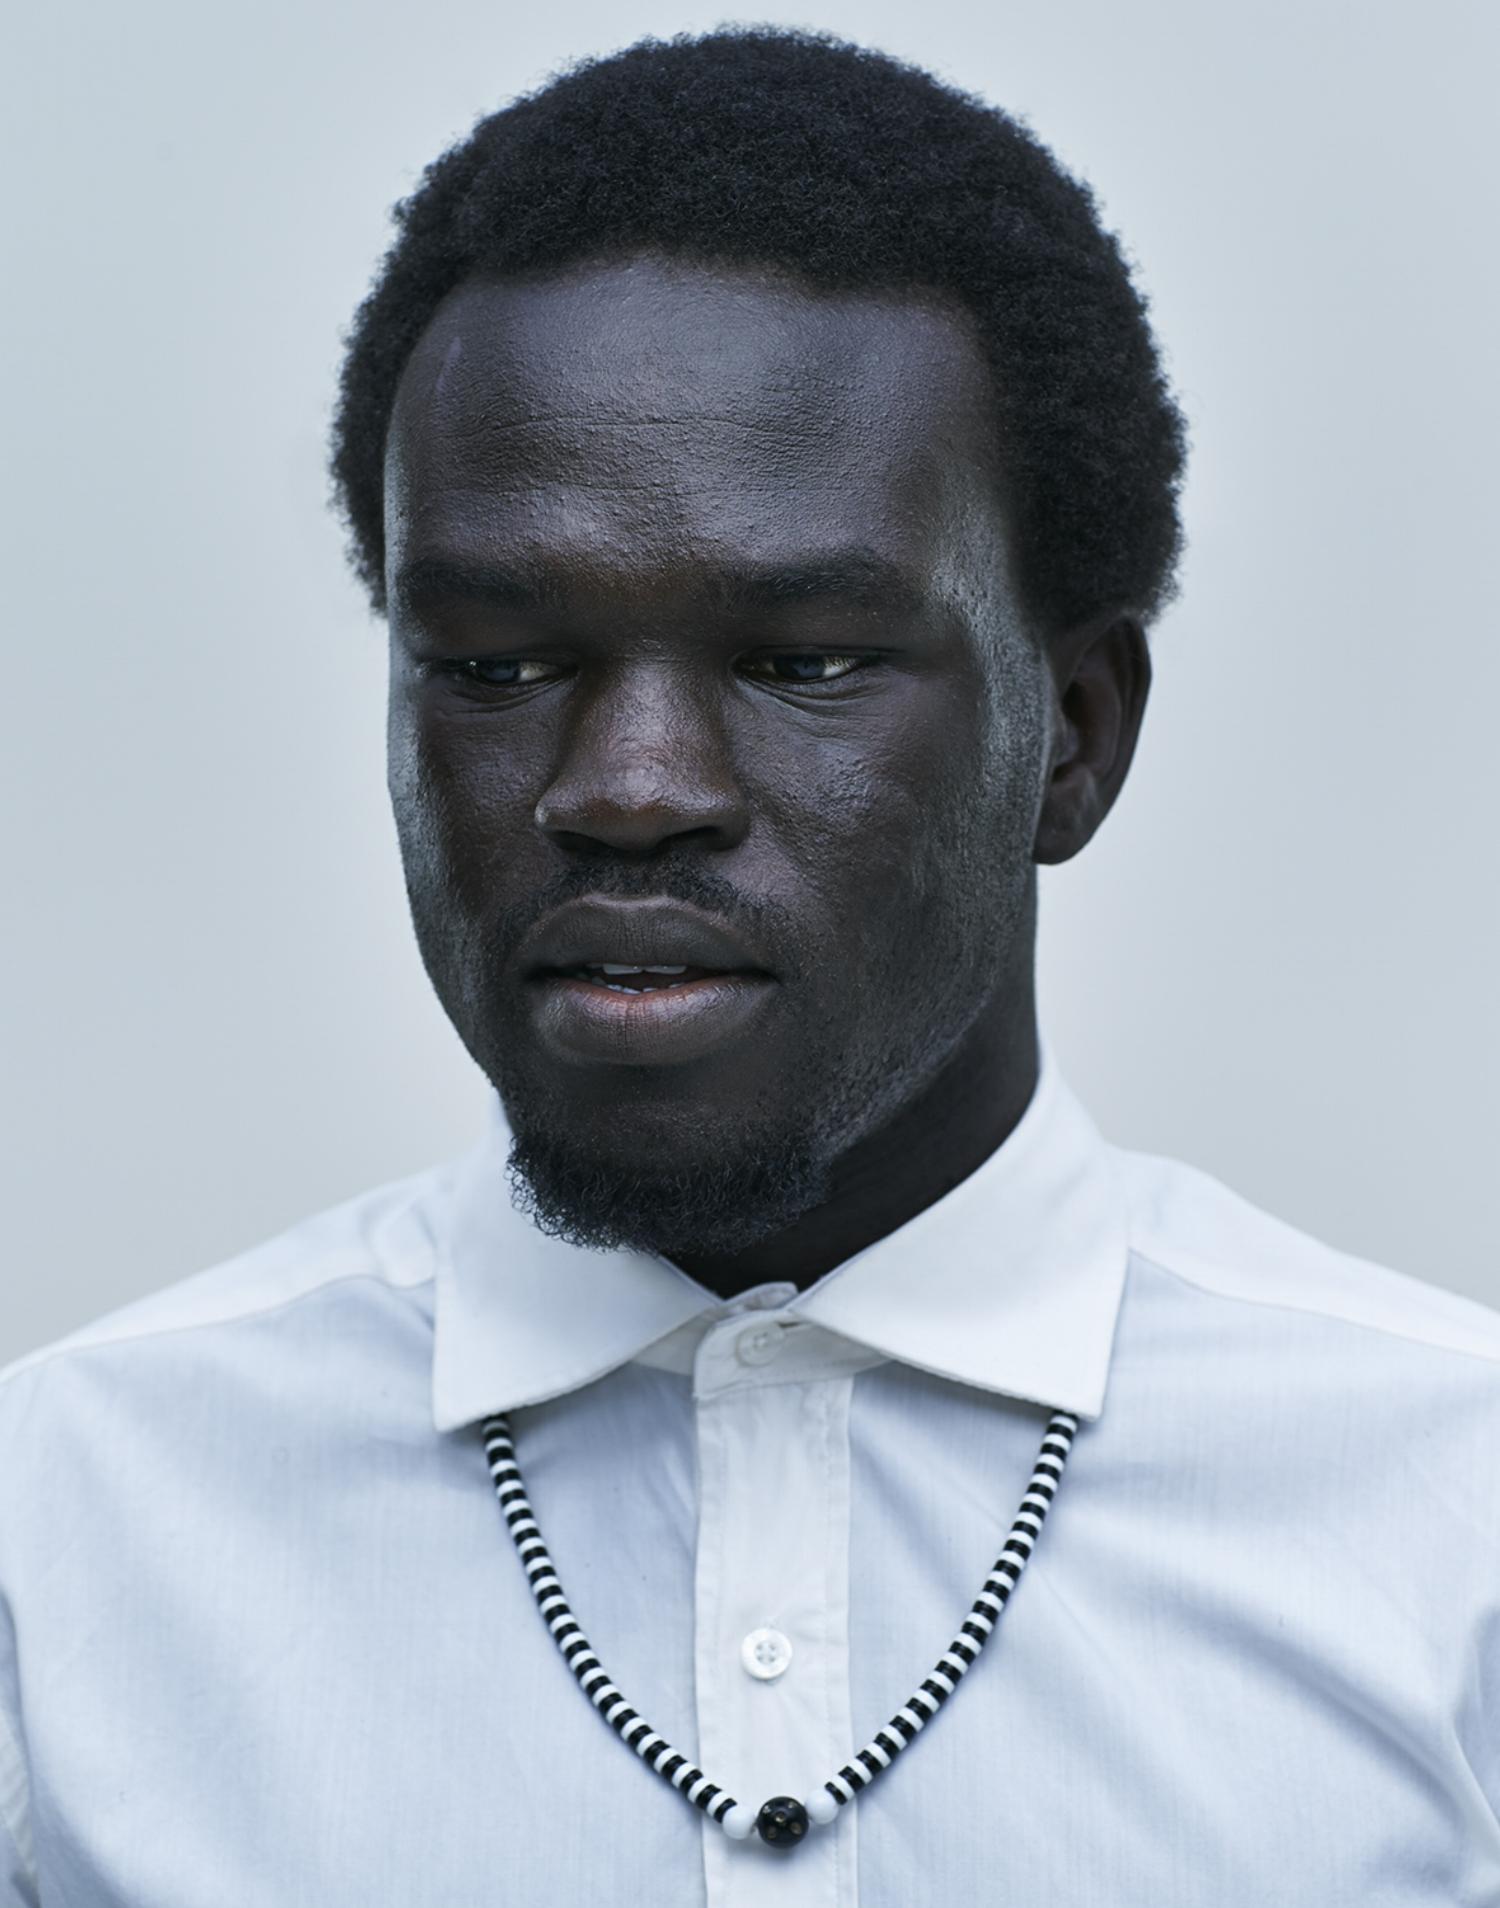 Abe Nouk - Poet & Founder of Creative Rebellion Youth